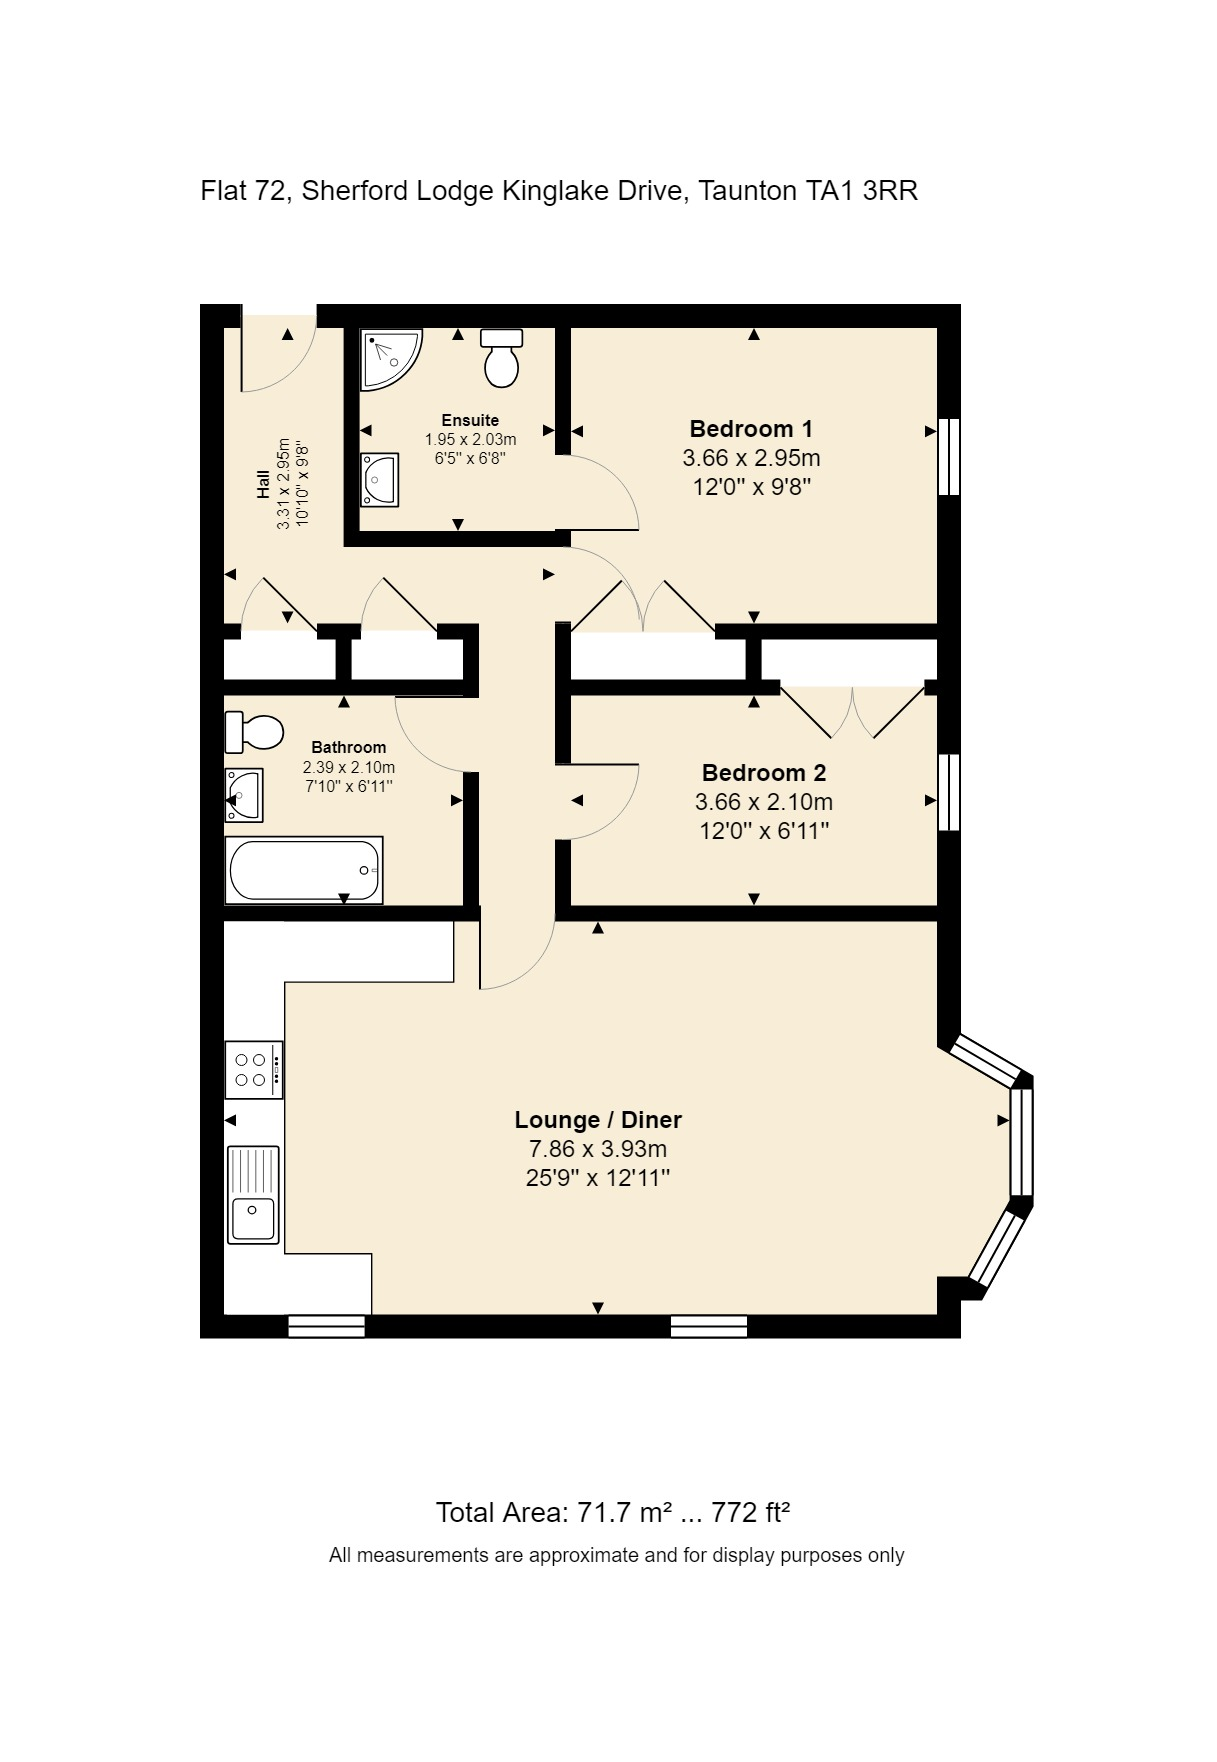 72 Sherford Lodge Floorplan